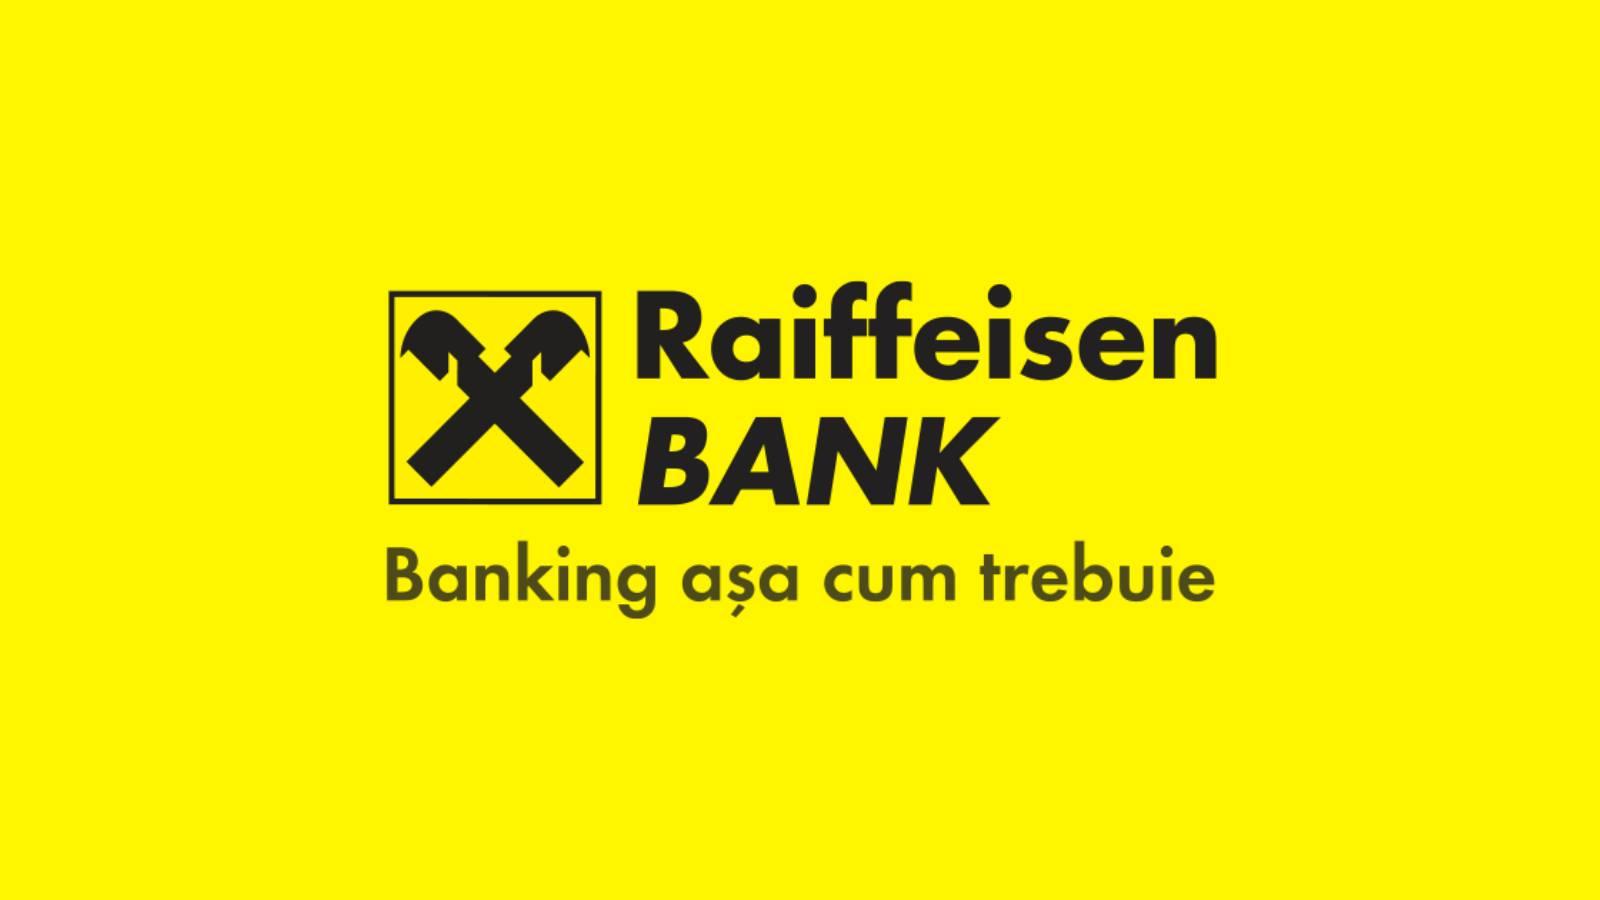 Raiffeisen Bank generatie